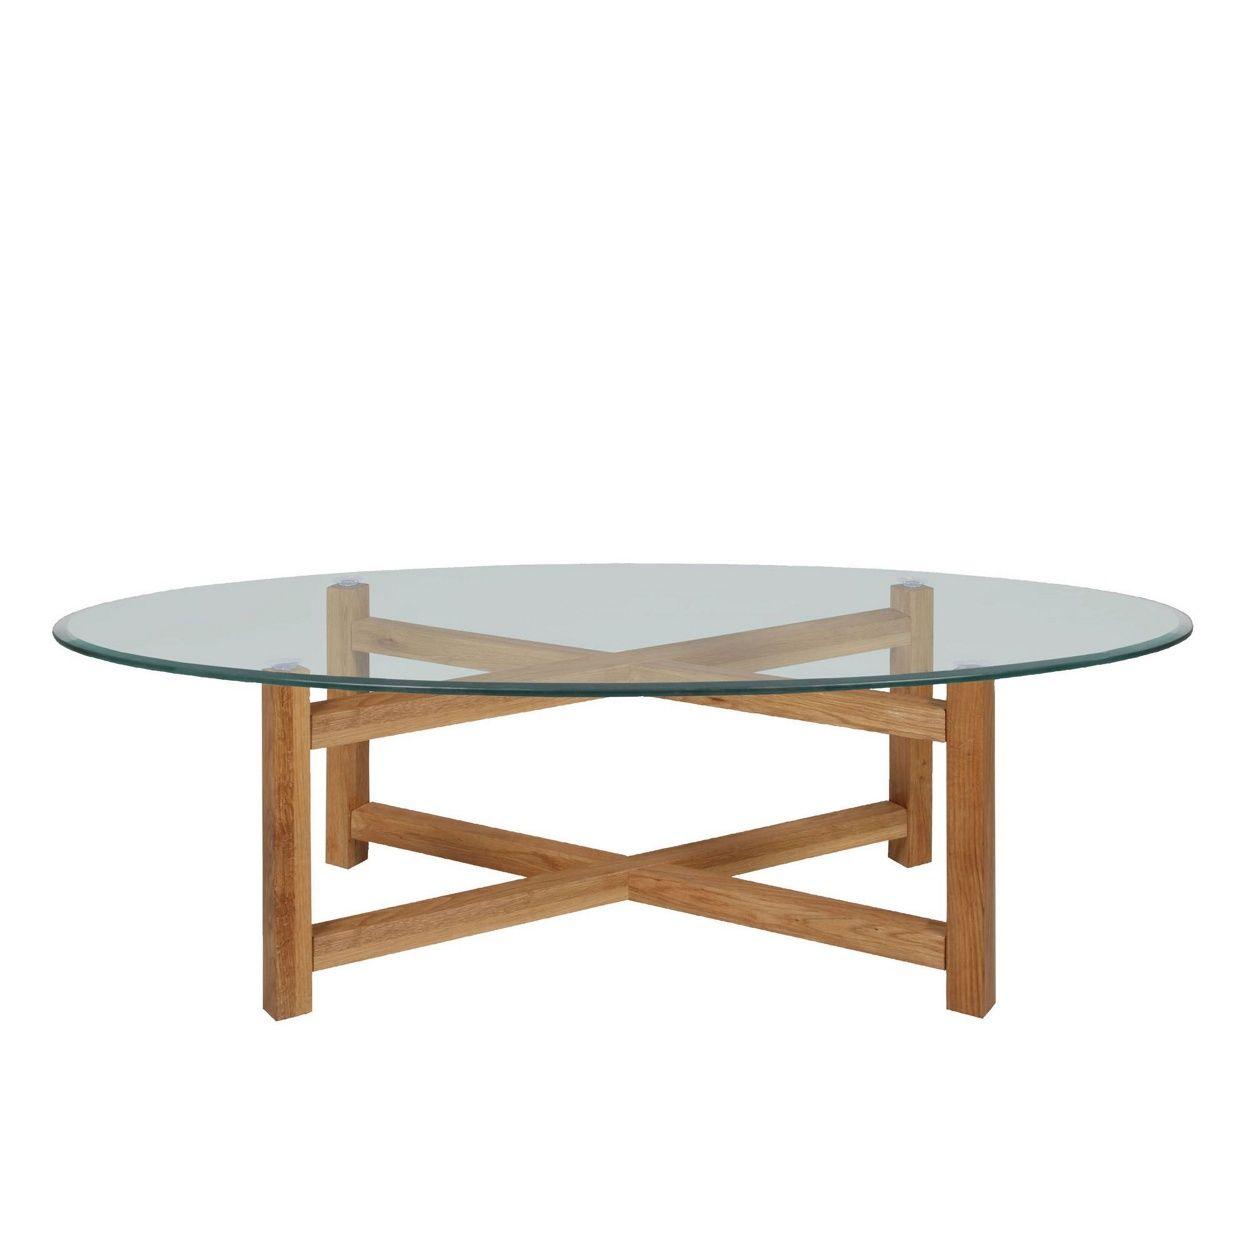 Debenhams oak and glass tokyo coffee table at debenhams debenhams oak and glass tokyo coffee table at debenhams geotapseo Images